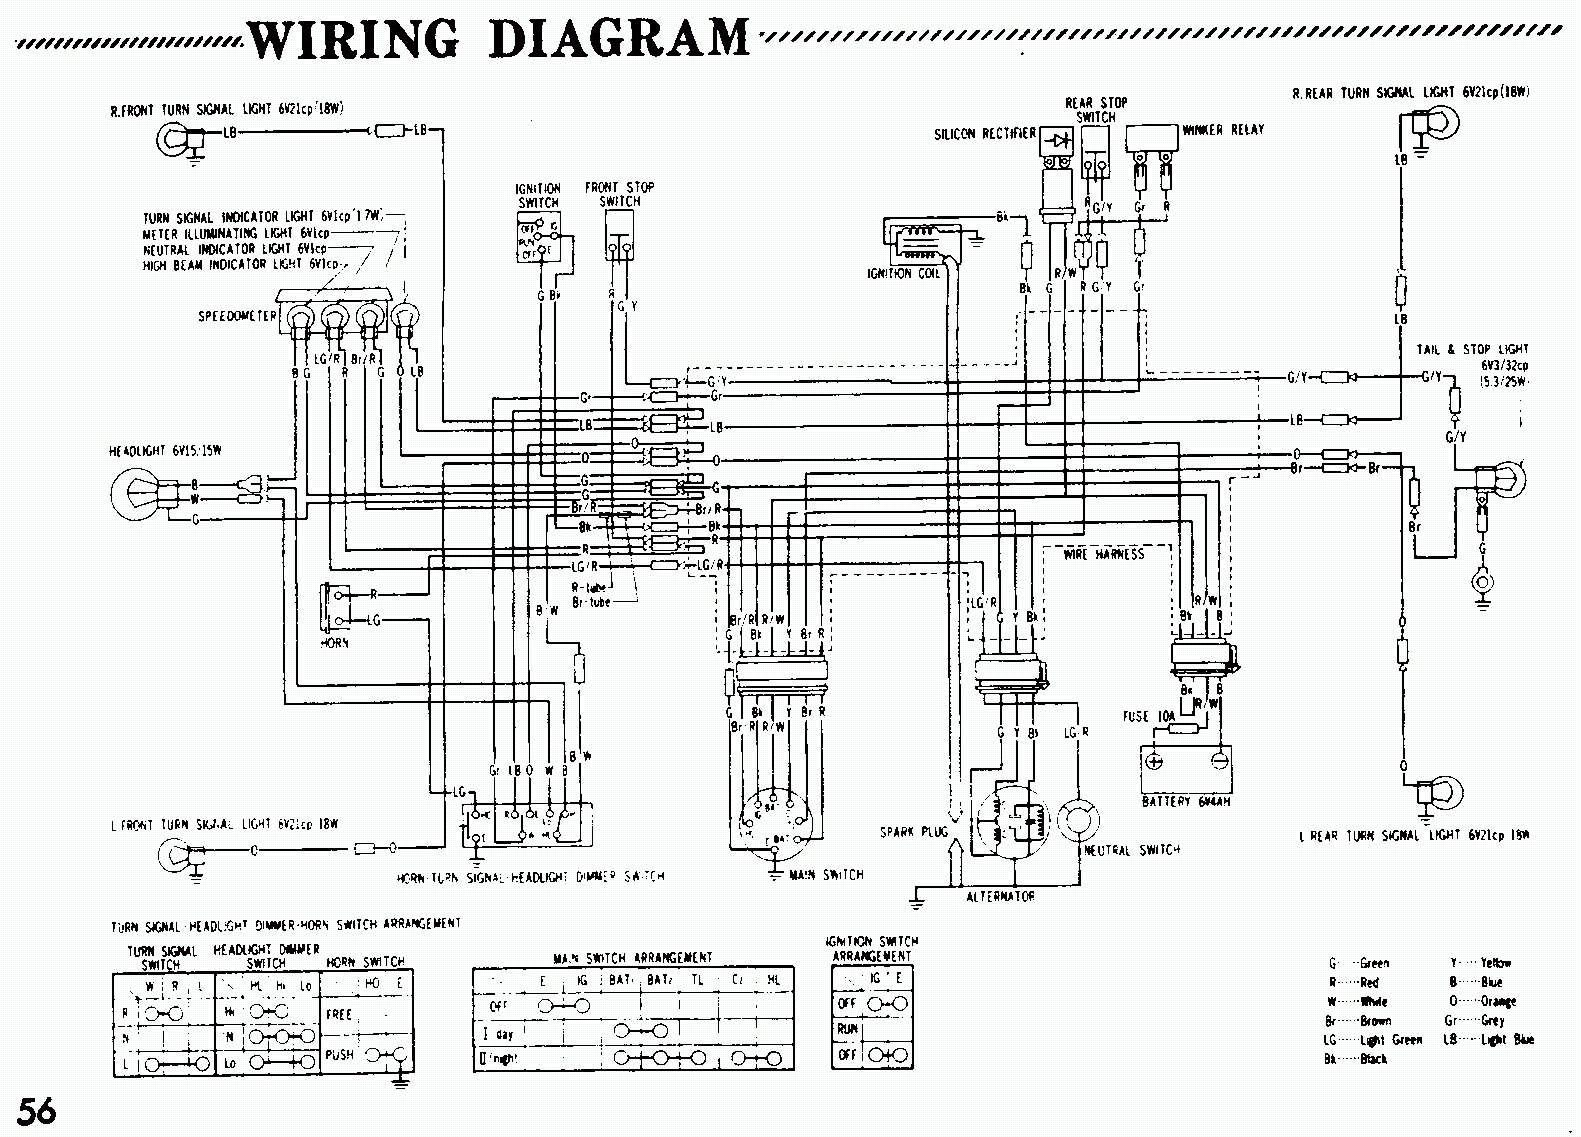 Lifan 125cc Pit Bike Wiring Diagram Explained Diagrams Chinese Honda Clone Engine 140 Electrical House U2022